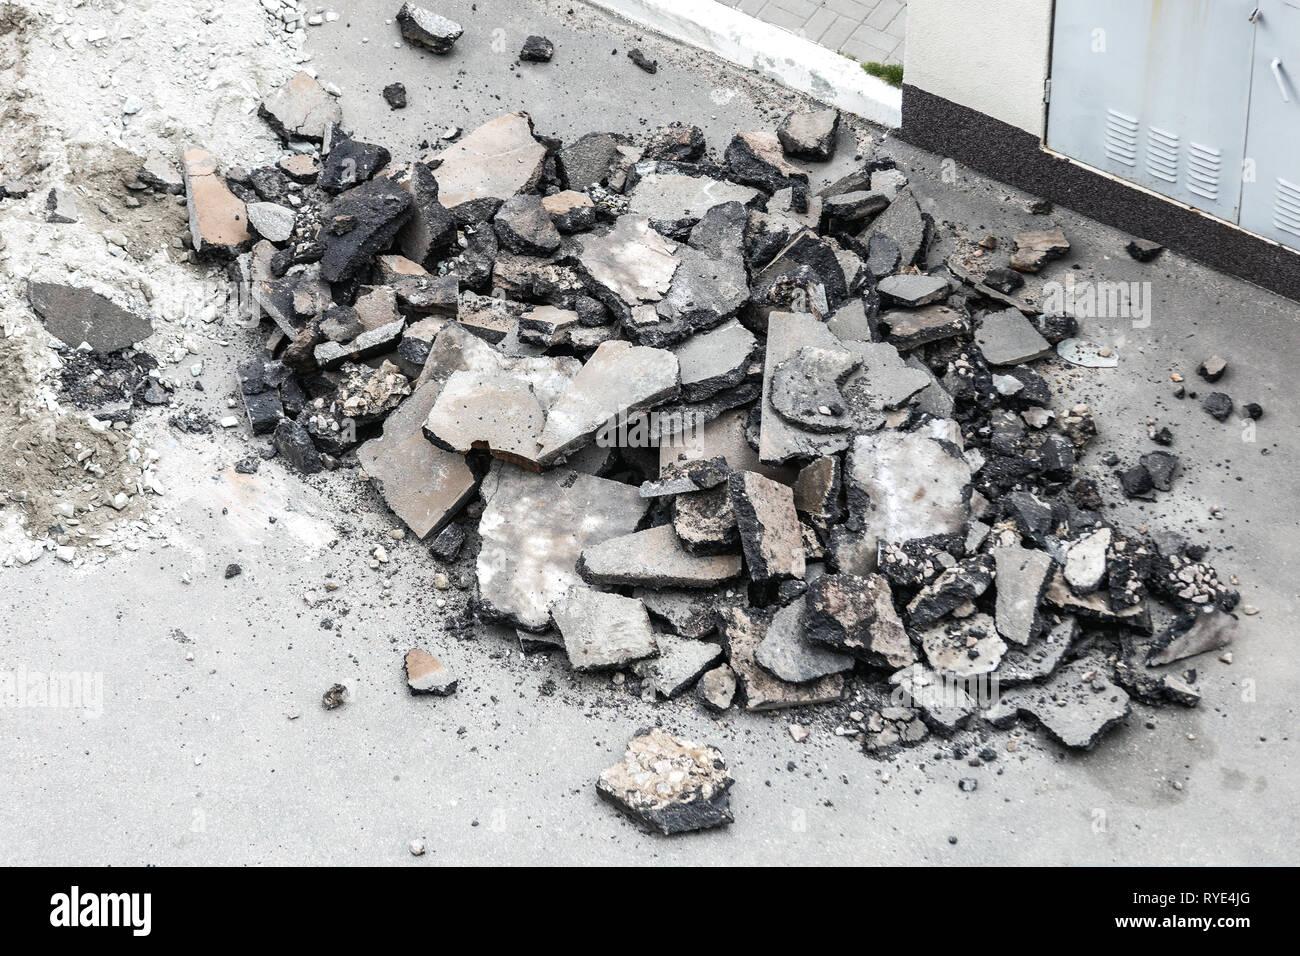 Pile of crushed broken asphalt. City road renewal. Heap of broken road surface - Stock Image